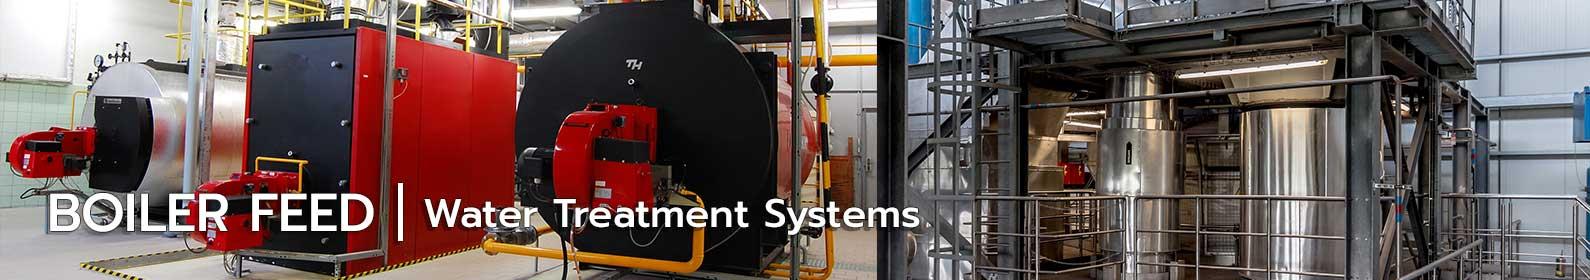 Boiler feed water treatment plants